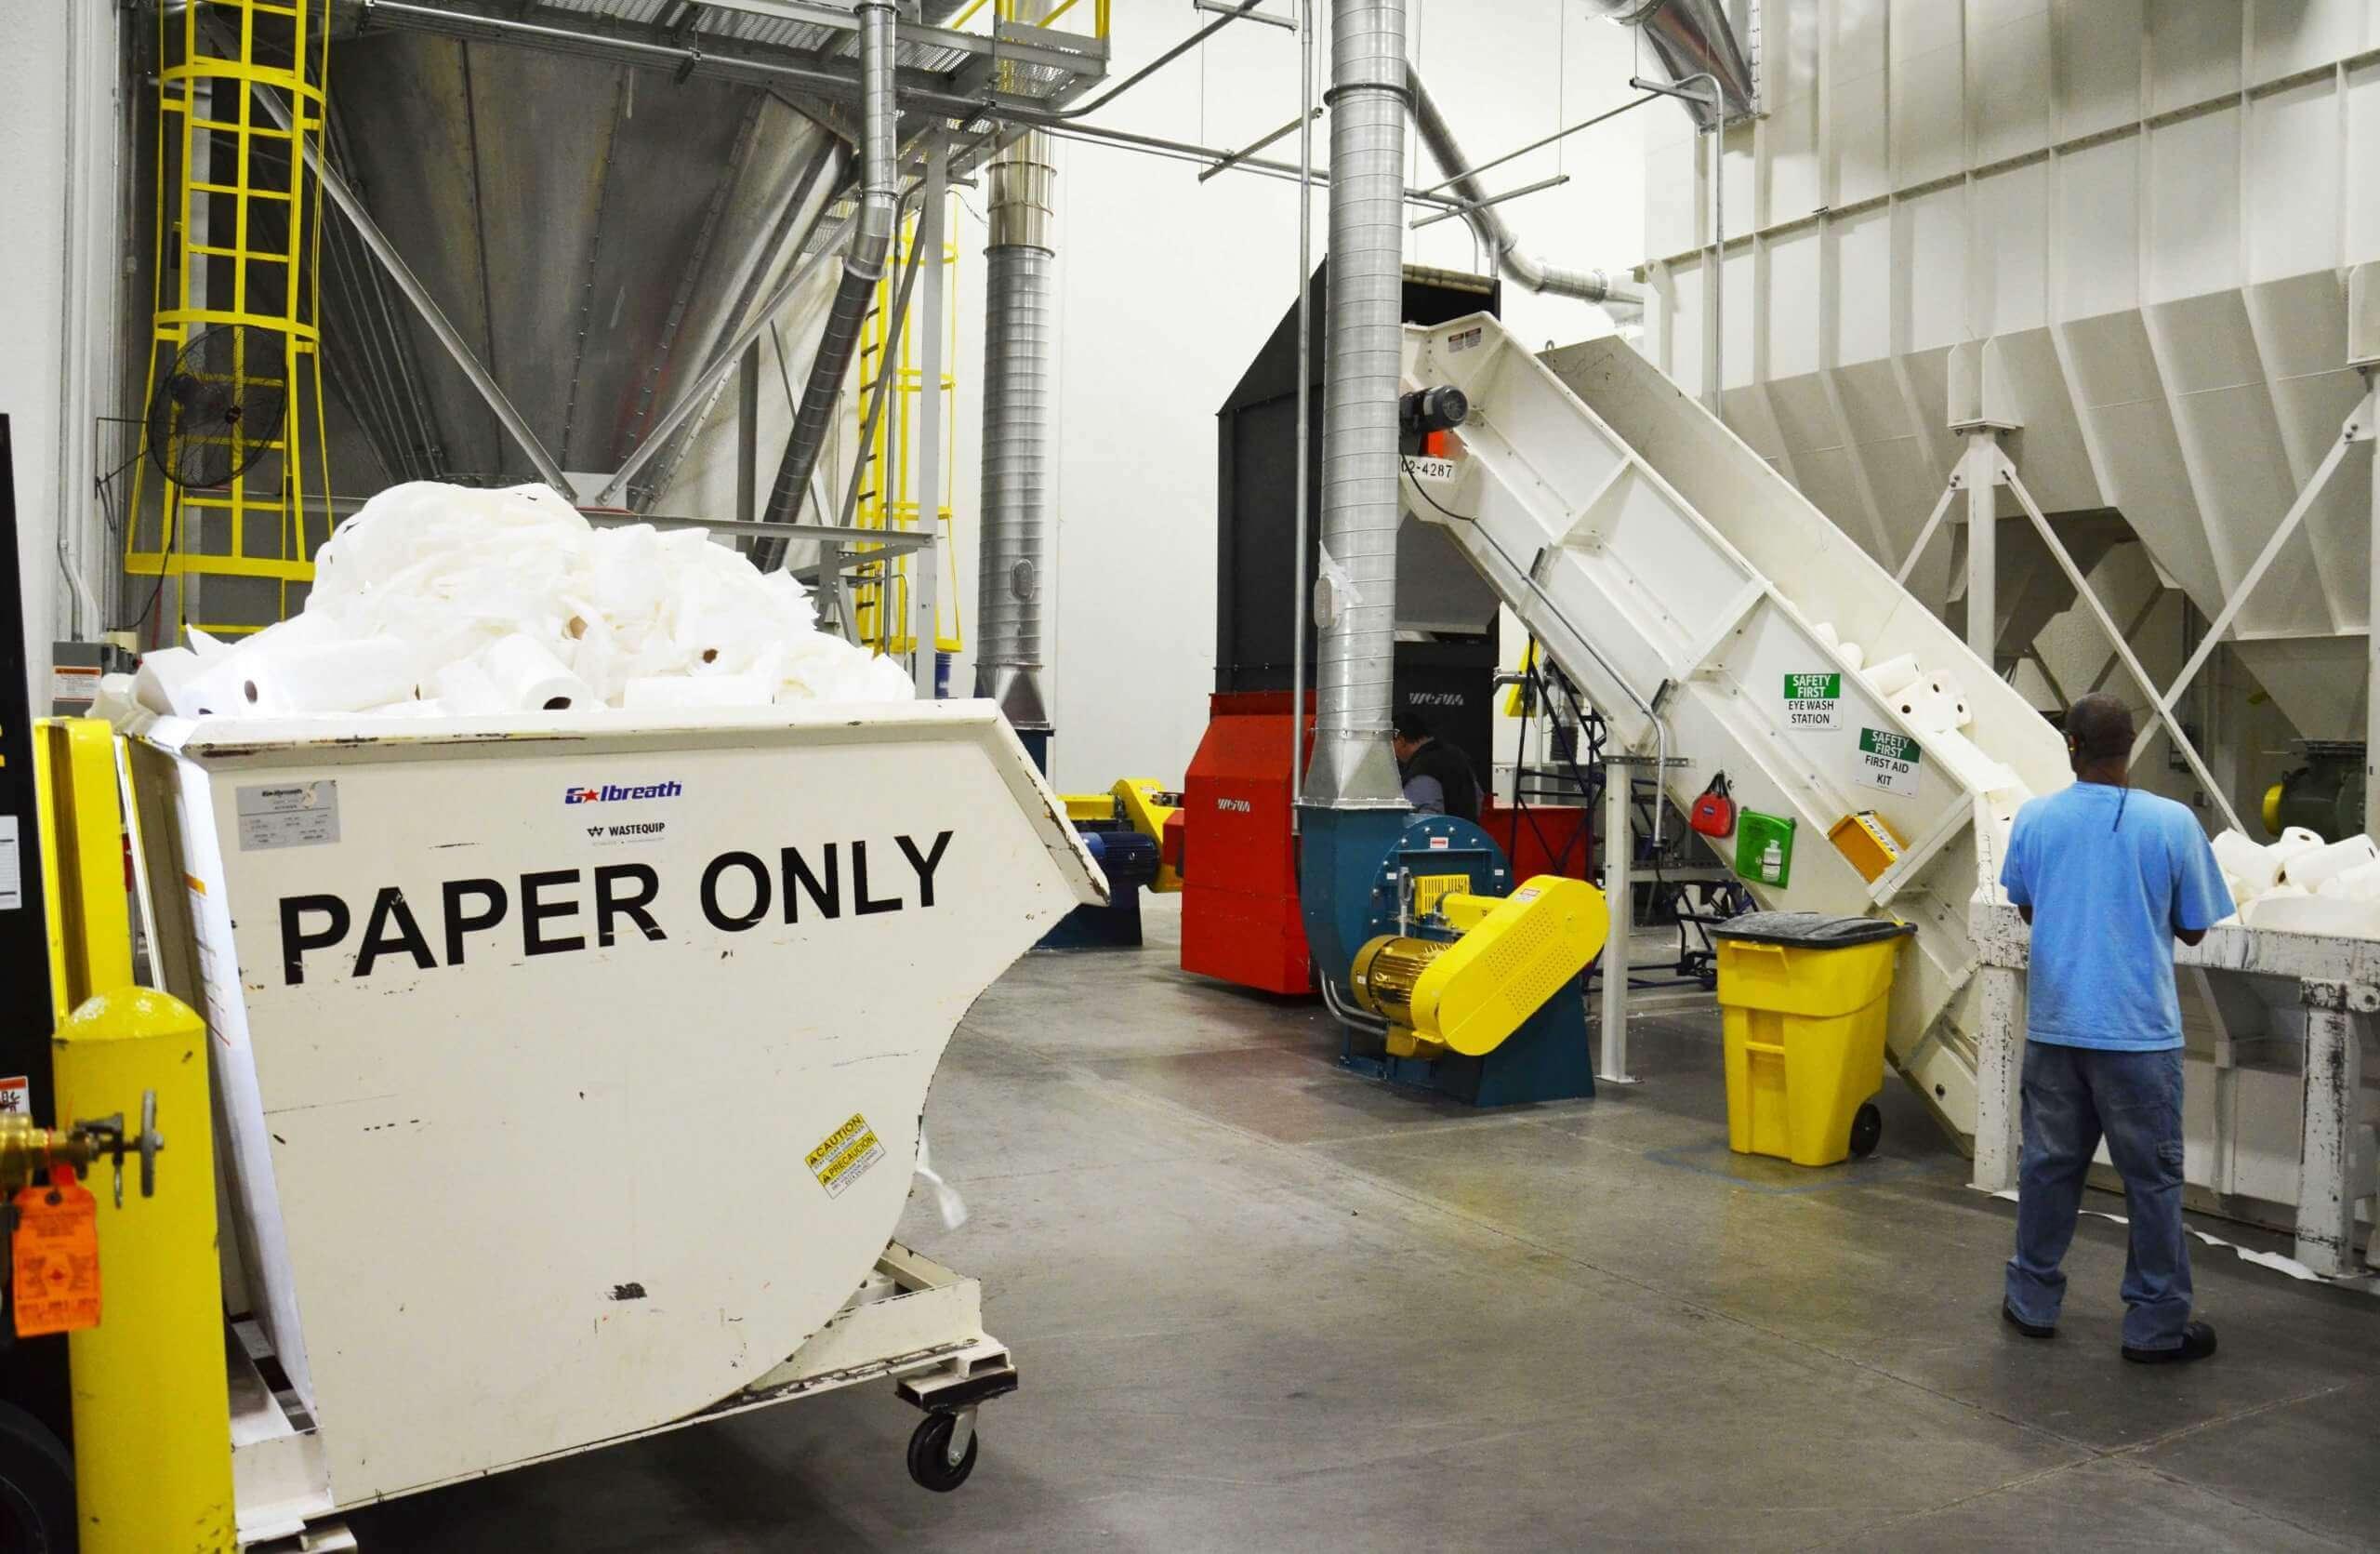 Produktionsabfälle aus der Papierproduktion werden direkt recycelt